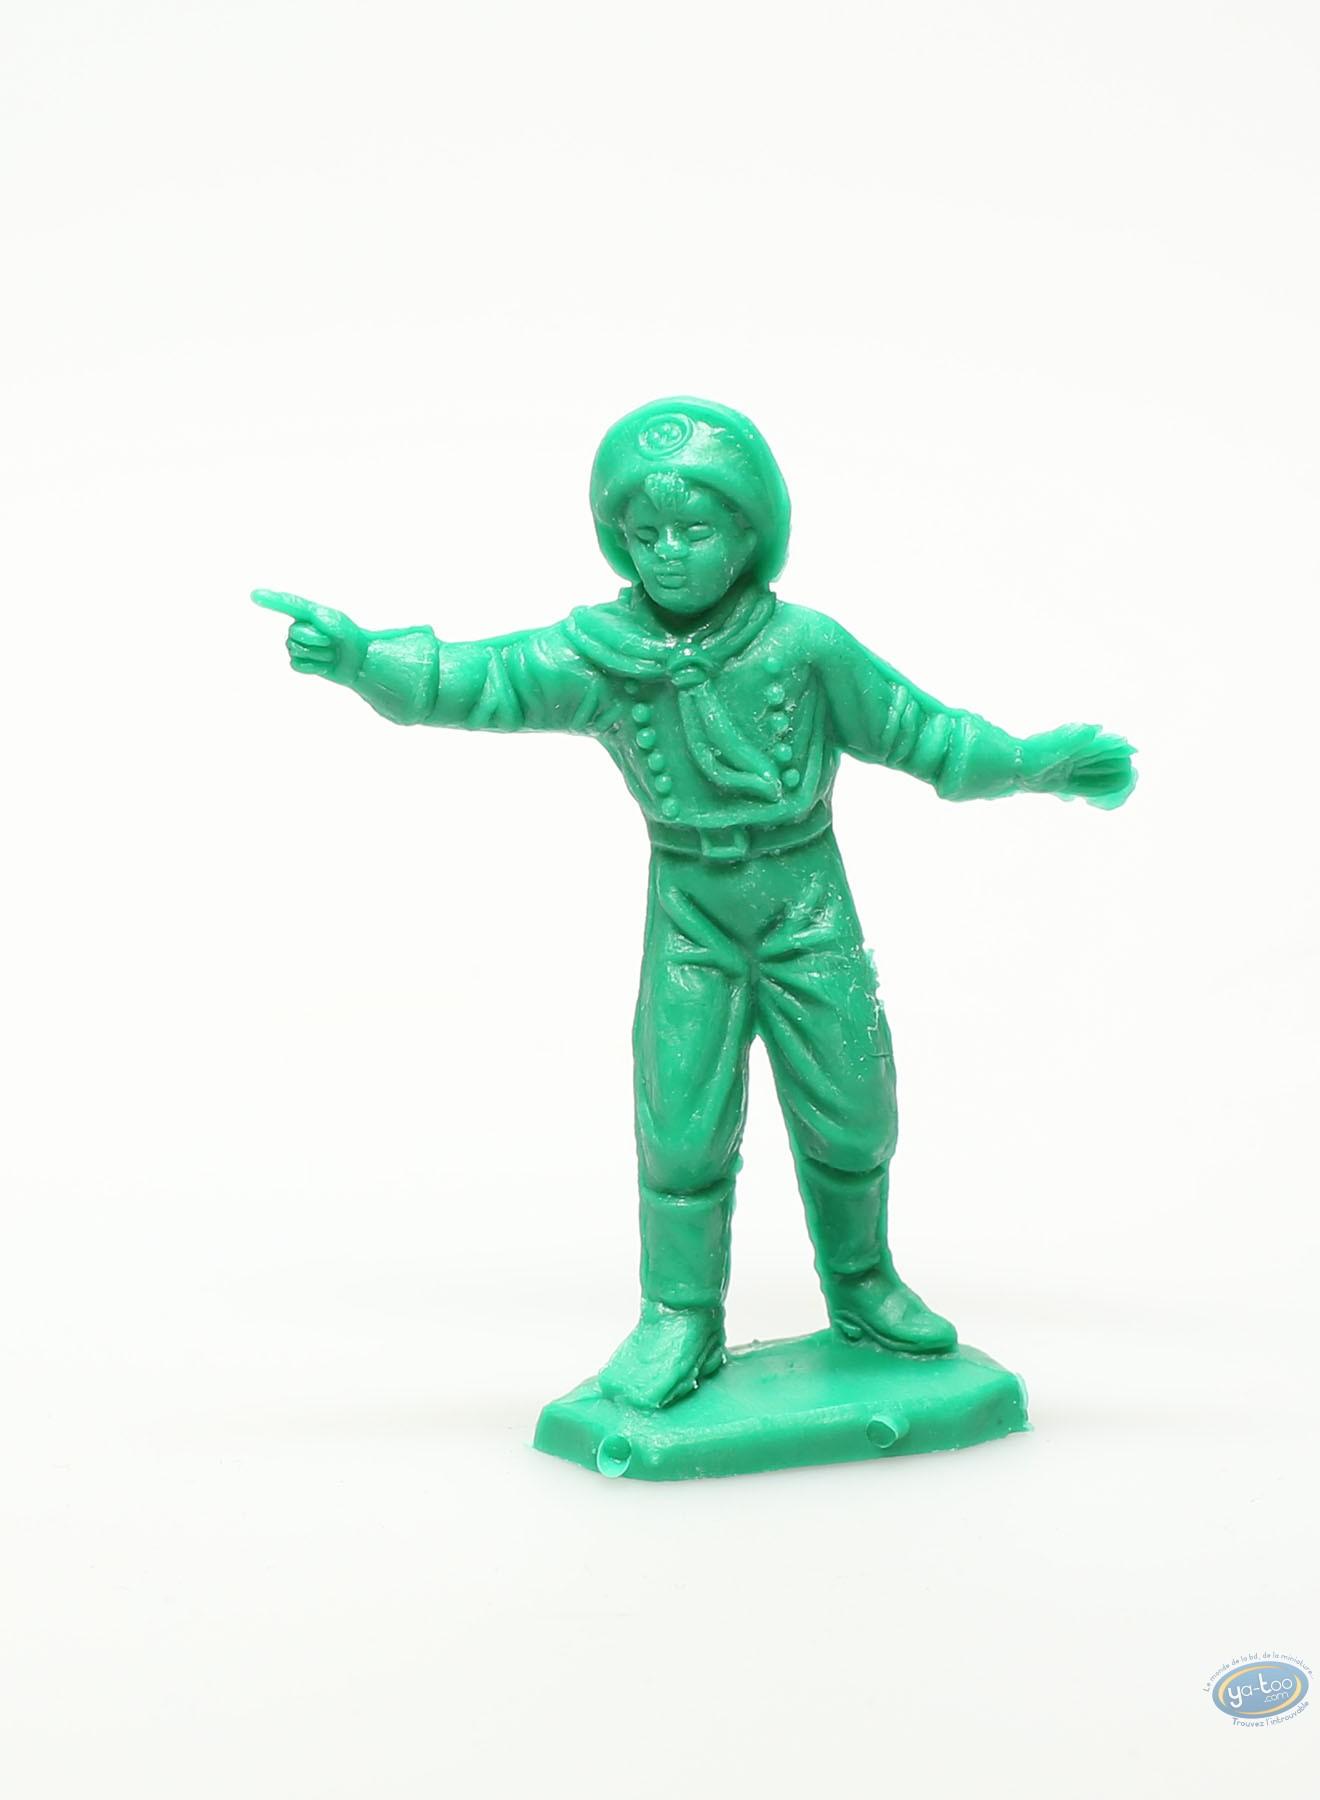 Plastic Figurine, Rintintin : Plastic figure : Young boy pointing green